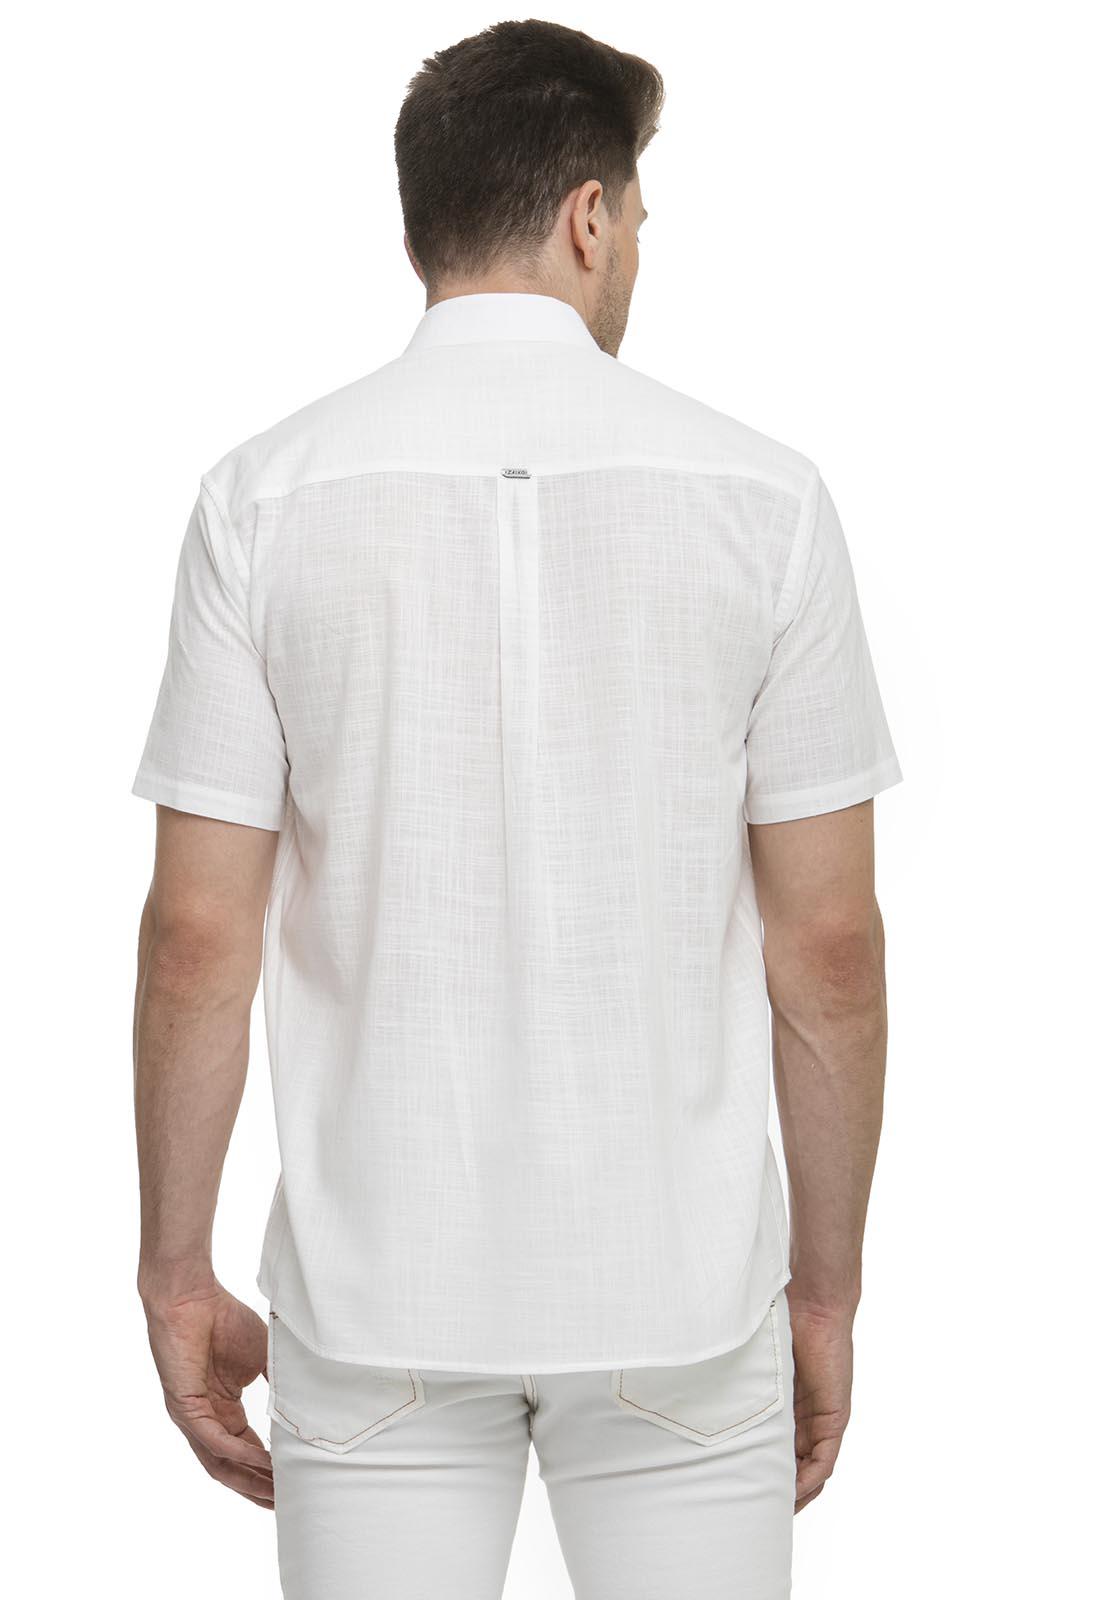 Camisa Clássica Zaiko Slub Manga Curta 2658